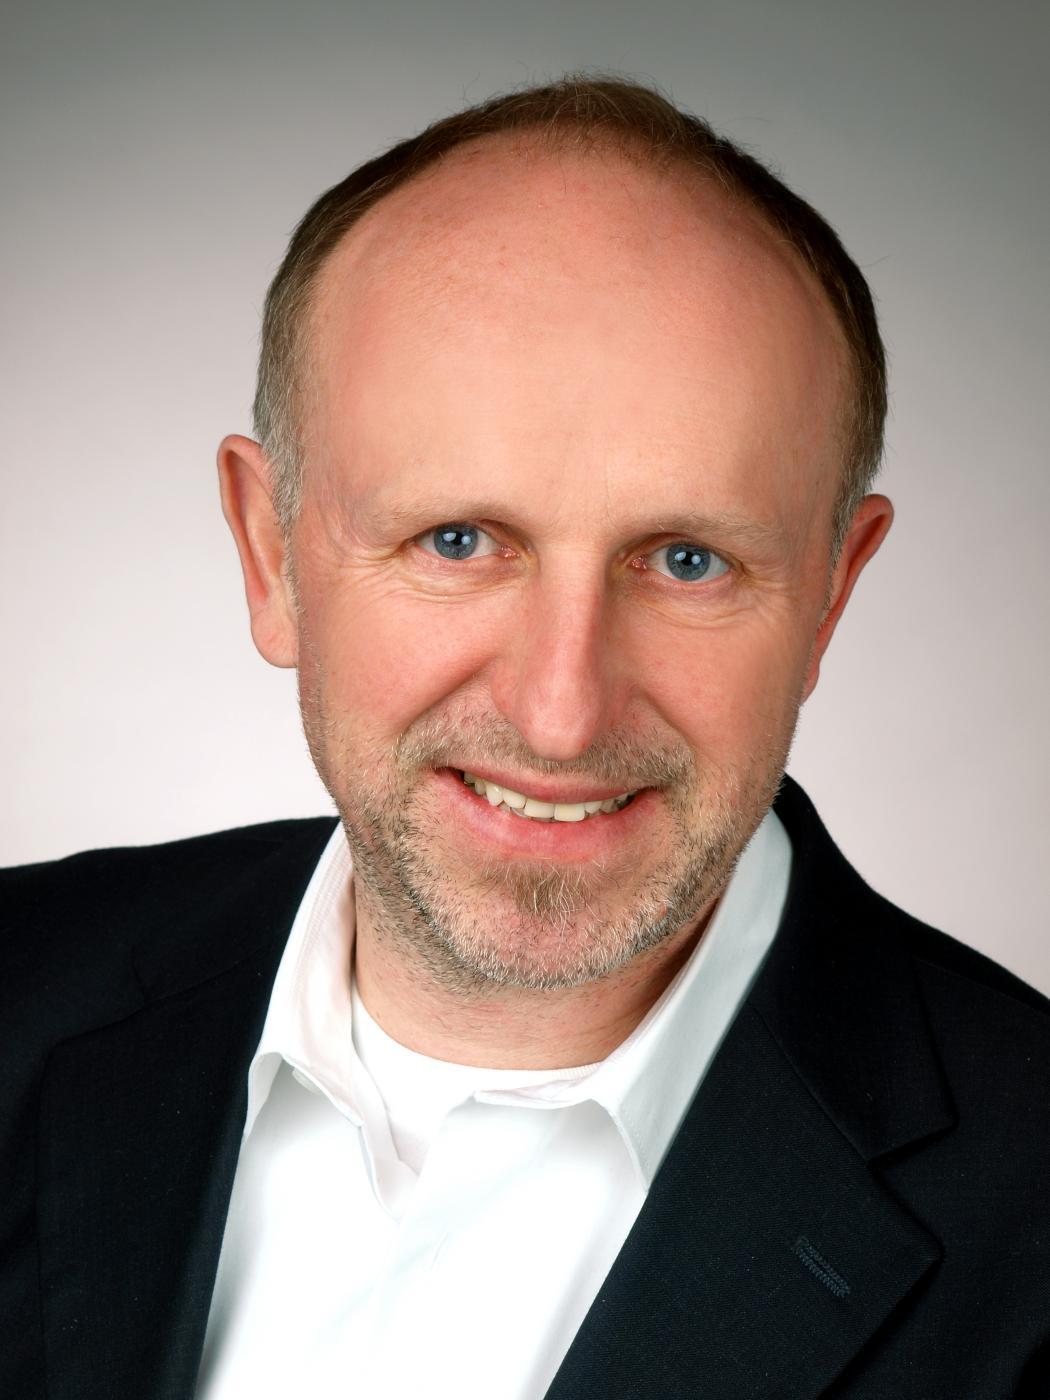 Wolfgang Müller, Universität Paderborn, DE